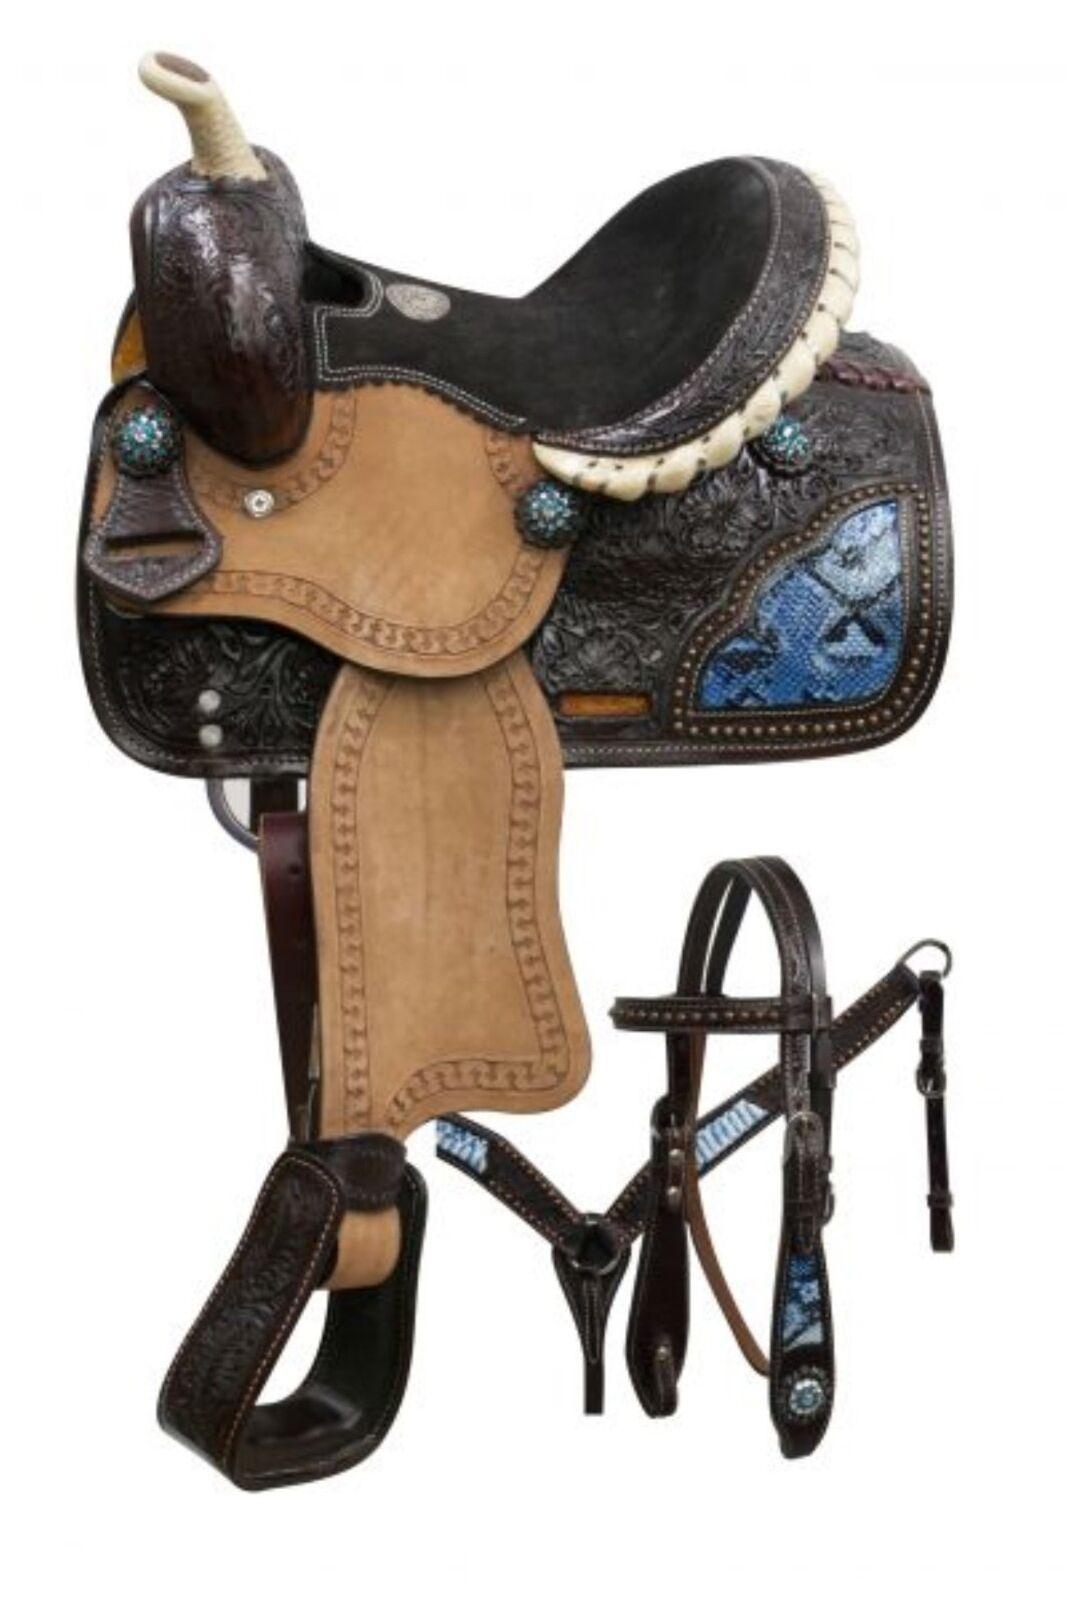 10 Double T Western Pony Saddle Set With blu Snake Print Inlay